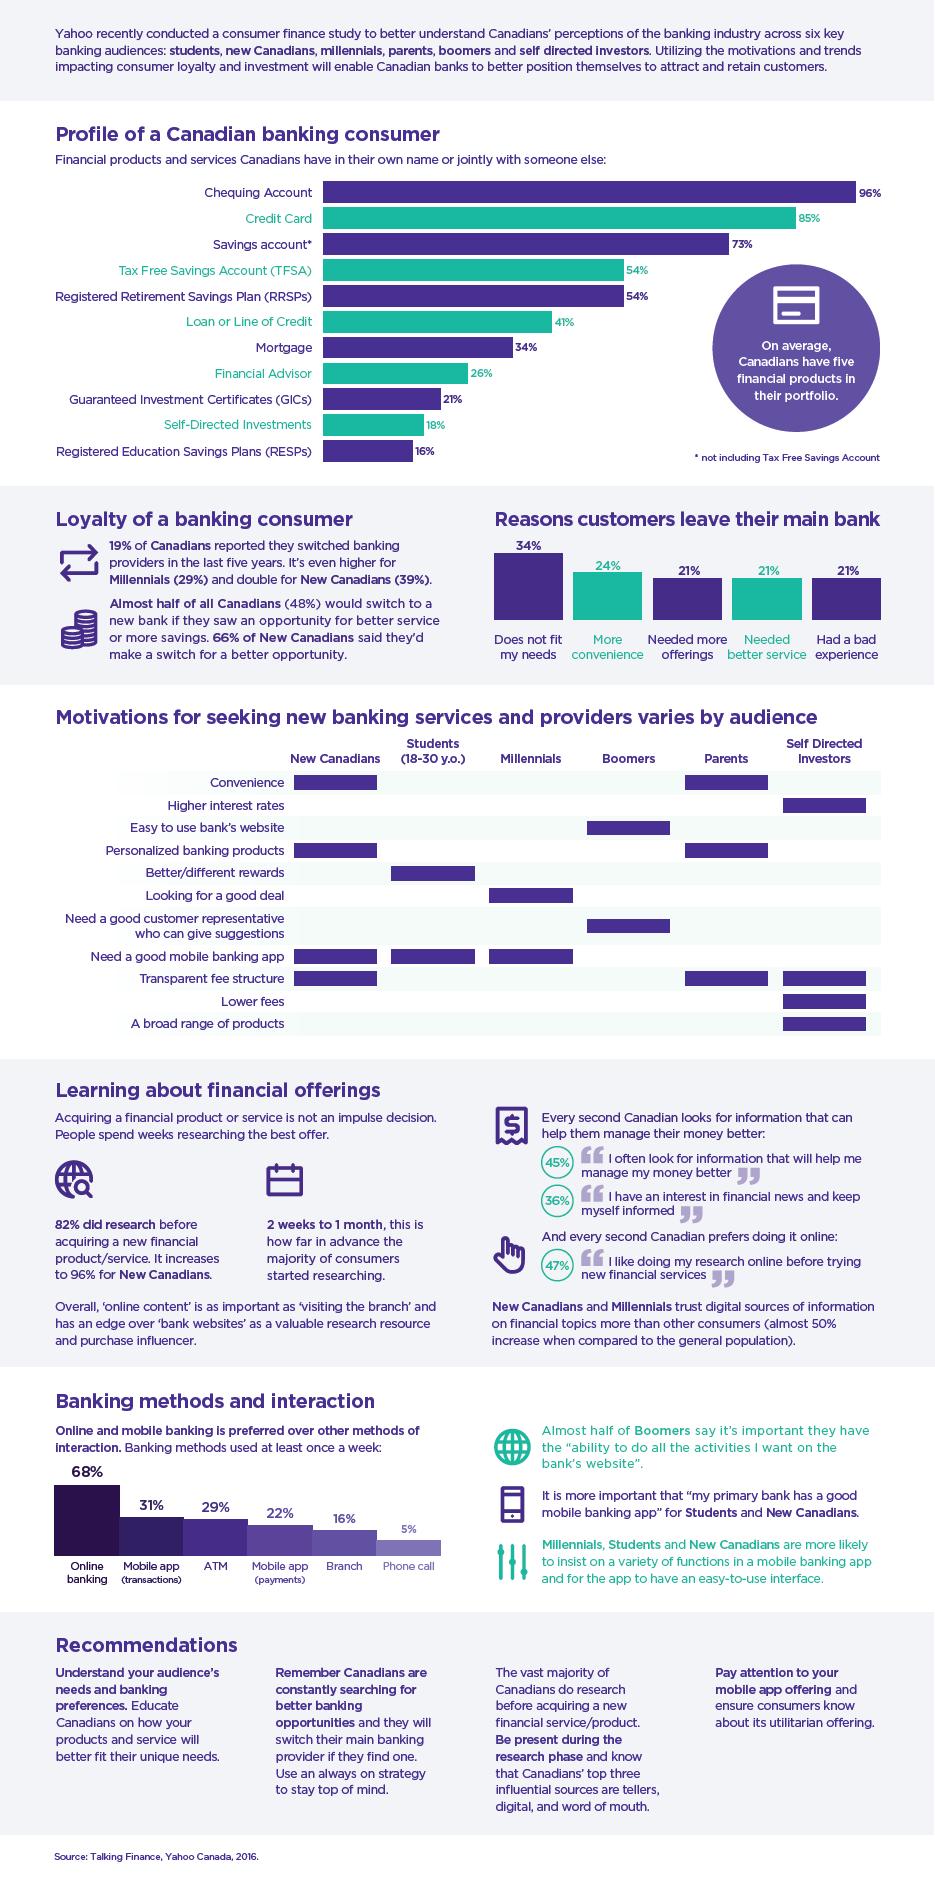 Yahoo Talking Finance infographic